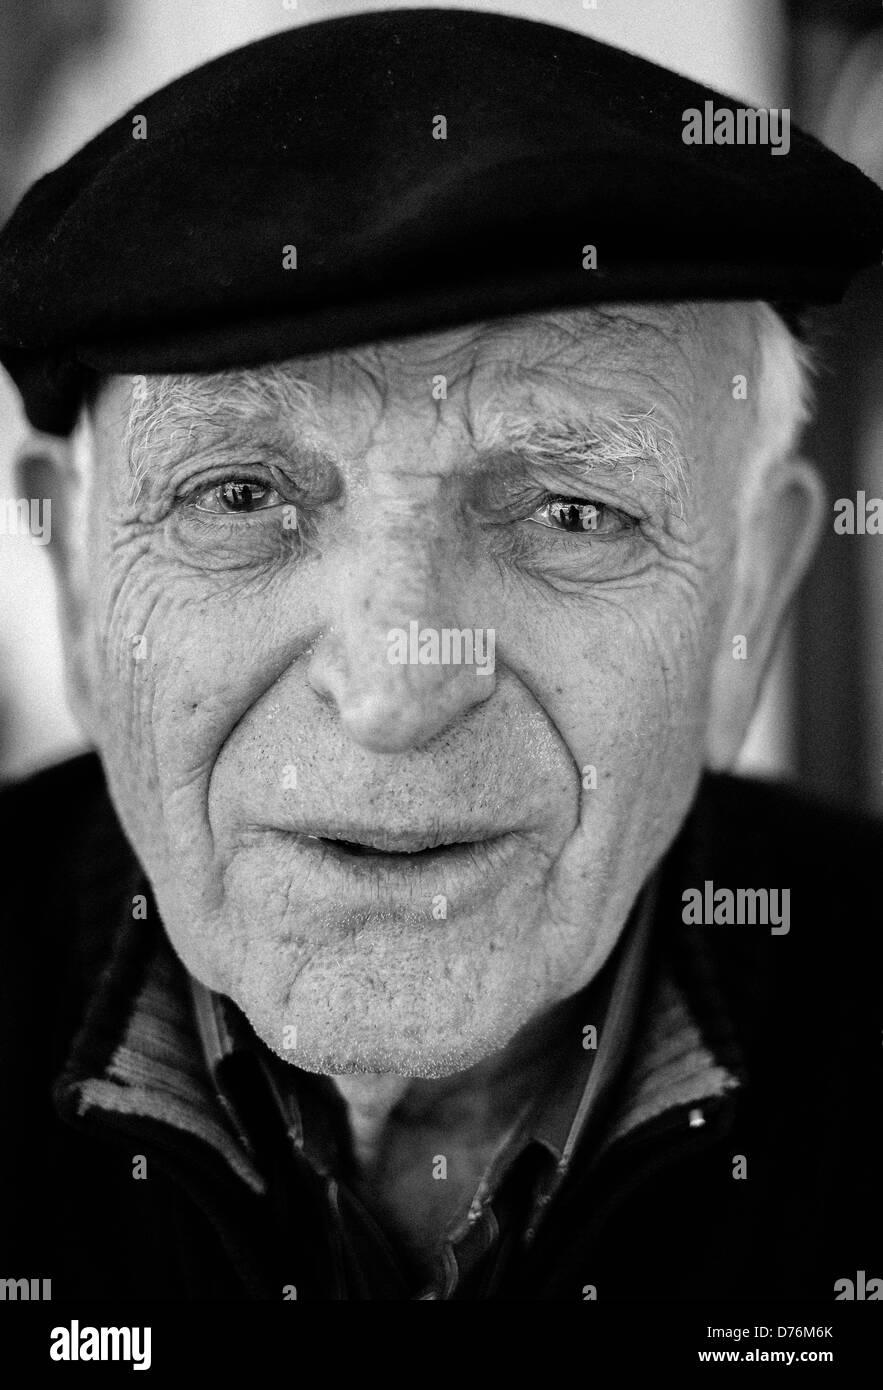 Paul Georgoulakos, owner of Gregory & Paul's Clam Bar on the Coney Island Boardwalk, Brooklyn New York. - Stock Image